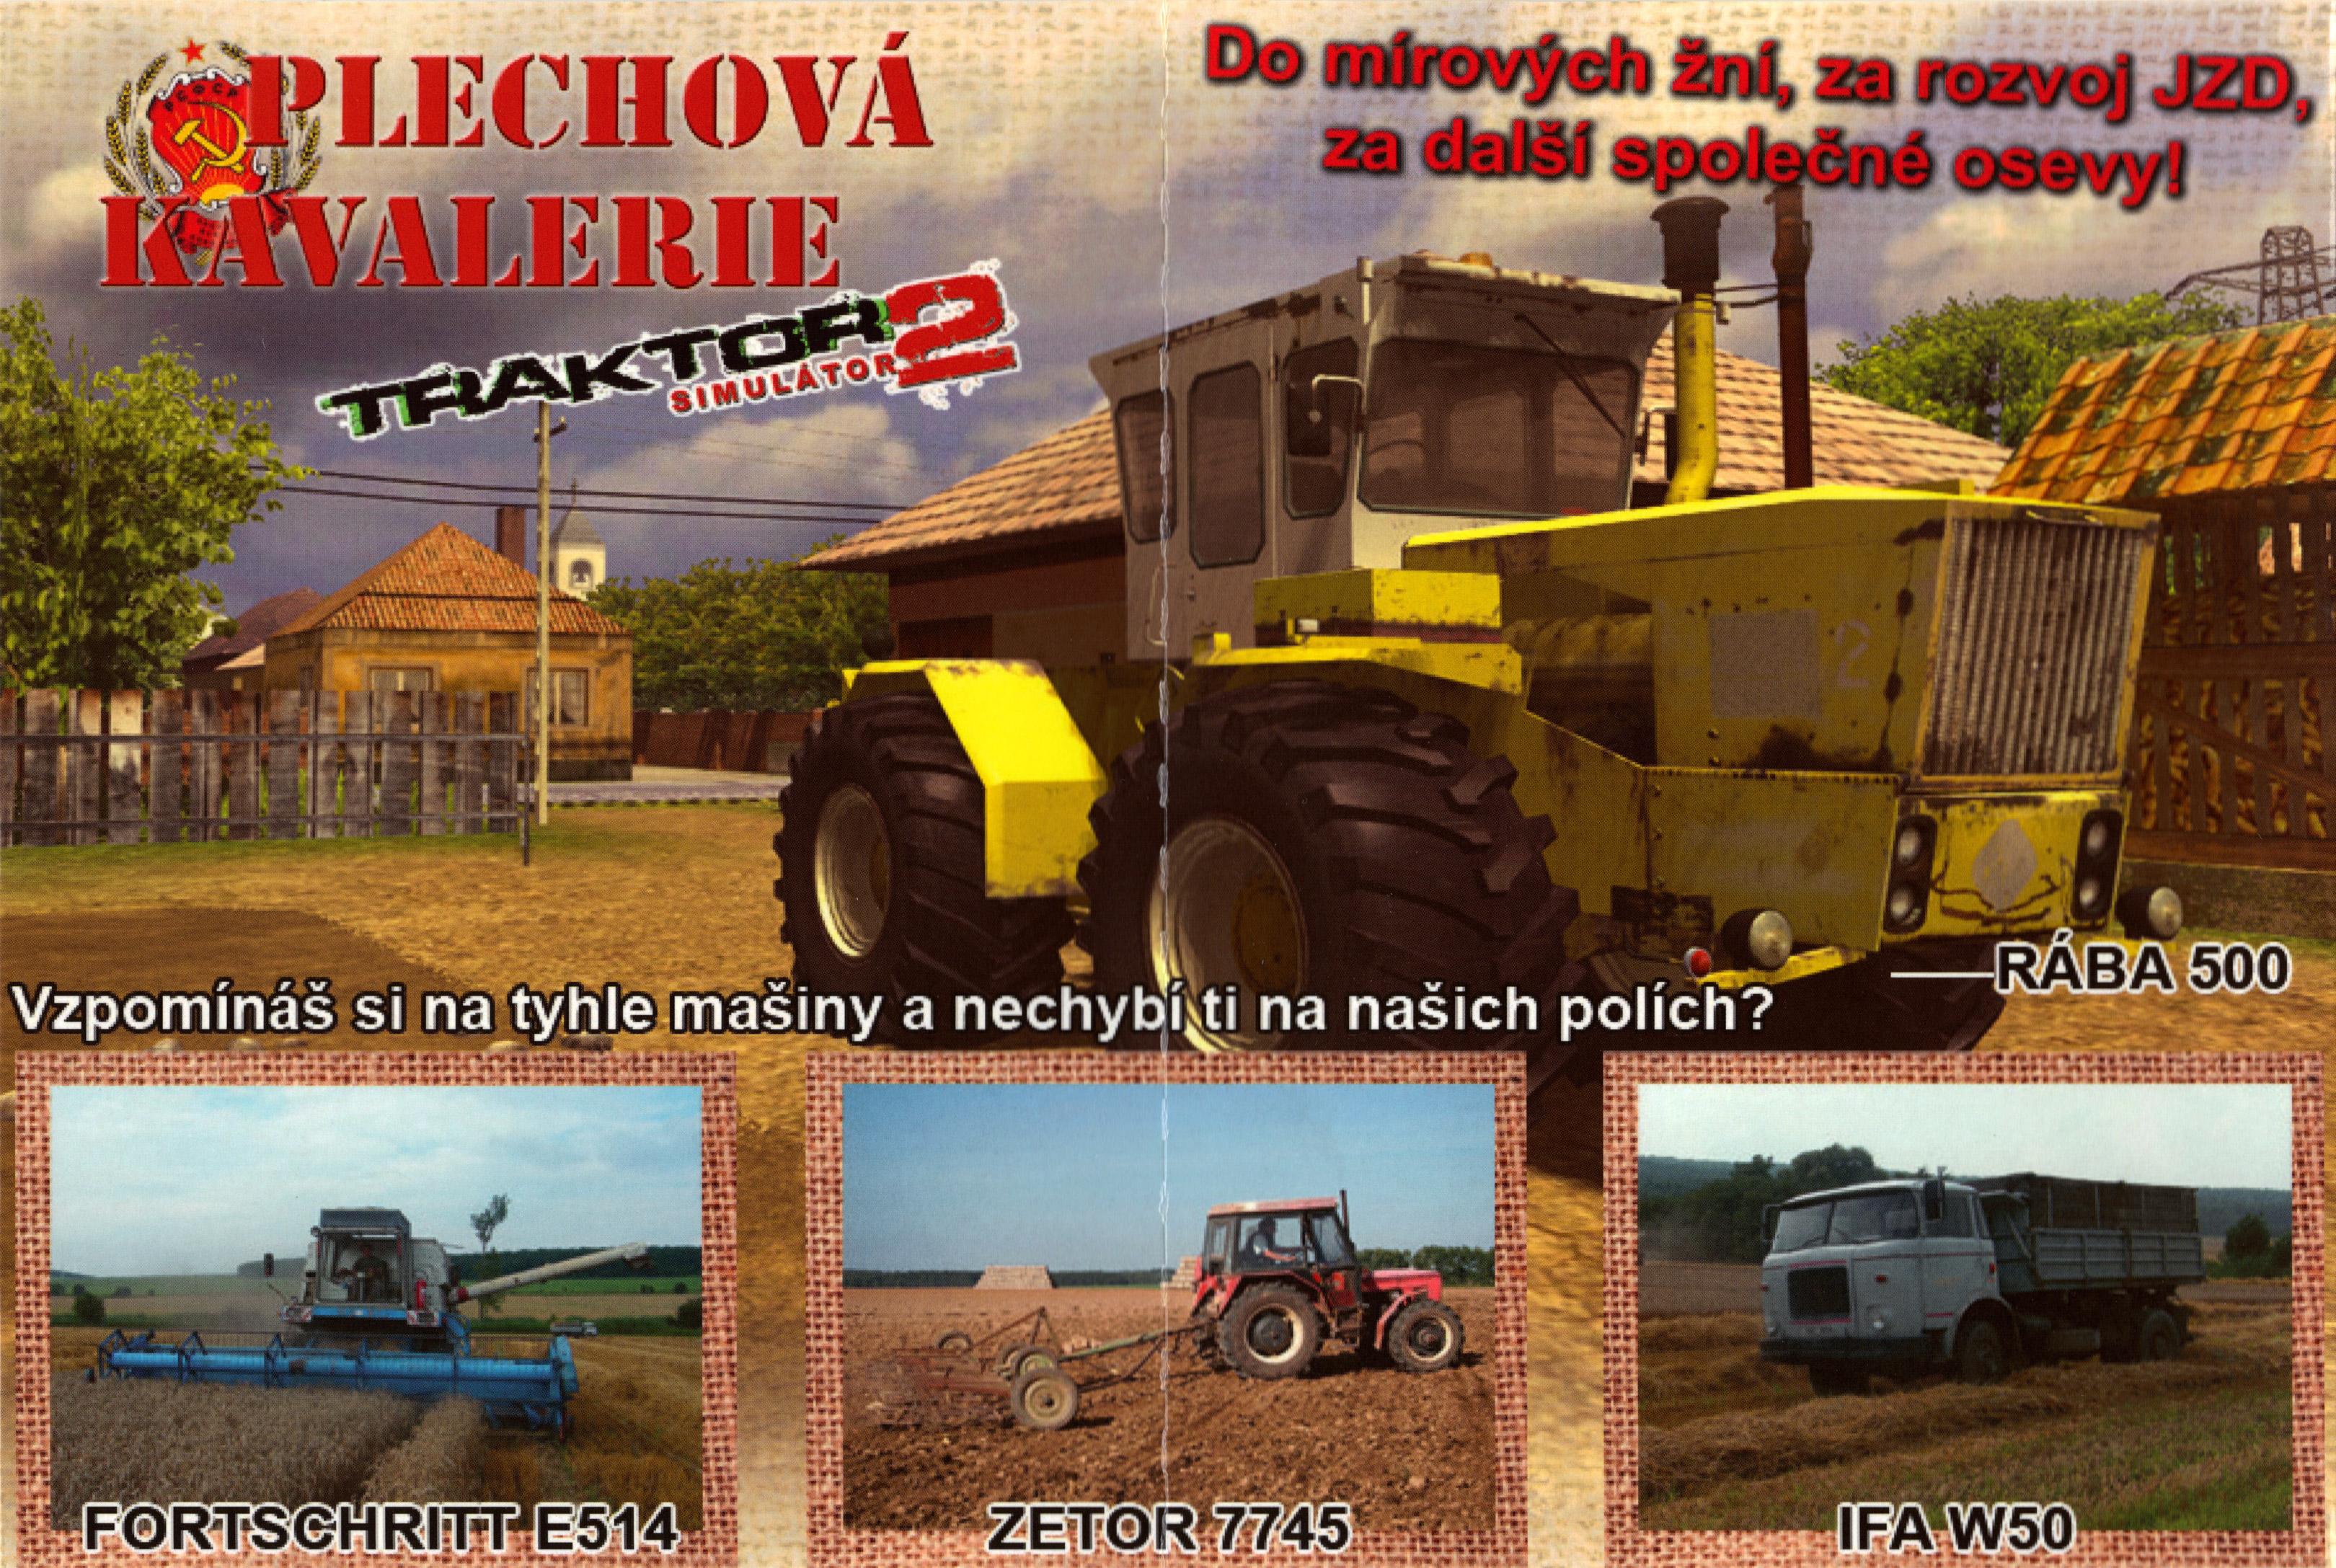 traktor zetor simulator 2011 plechova kavalerie